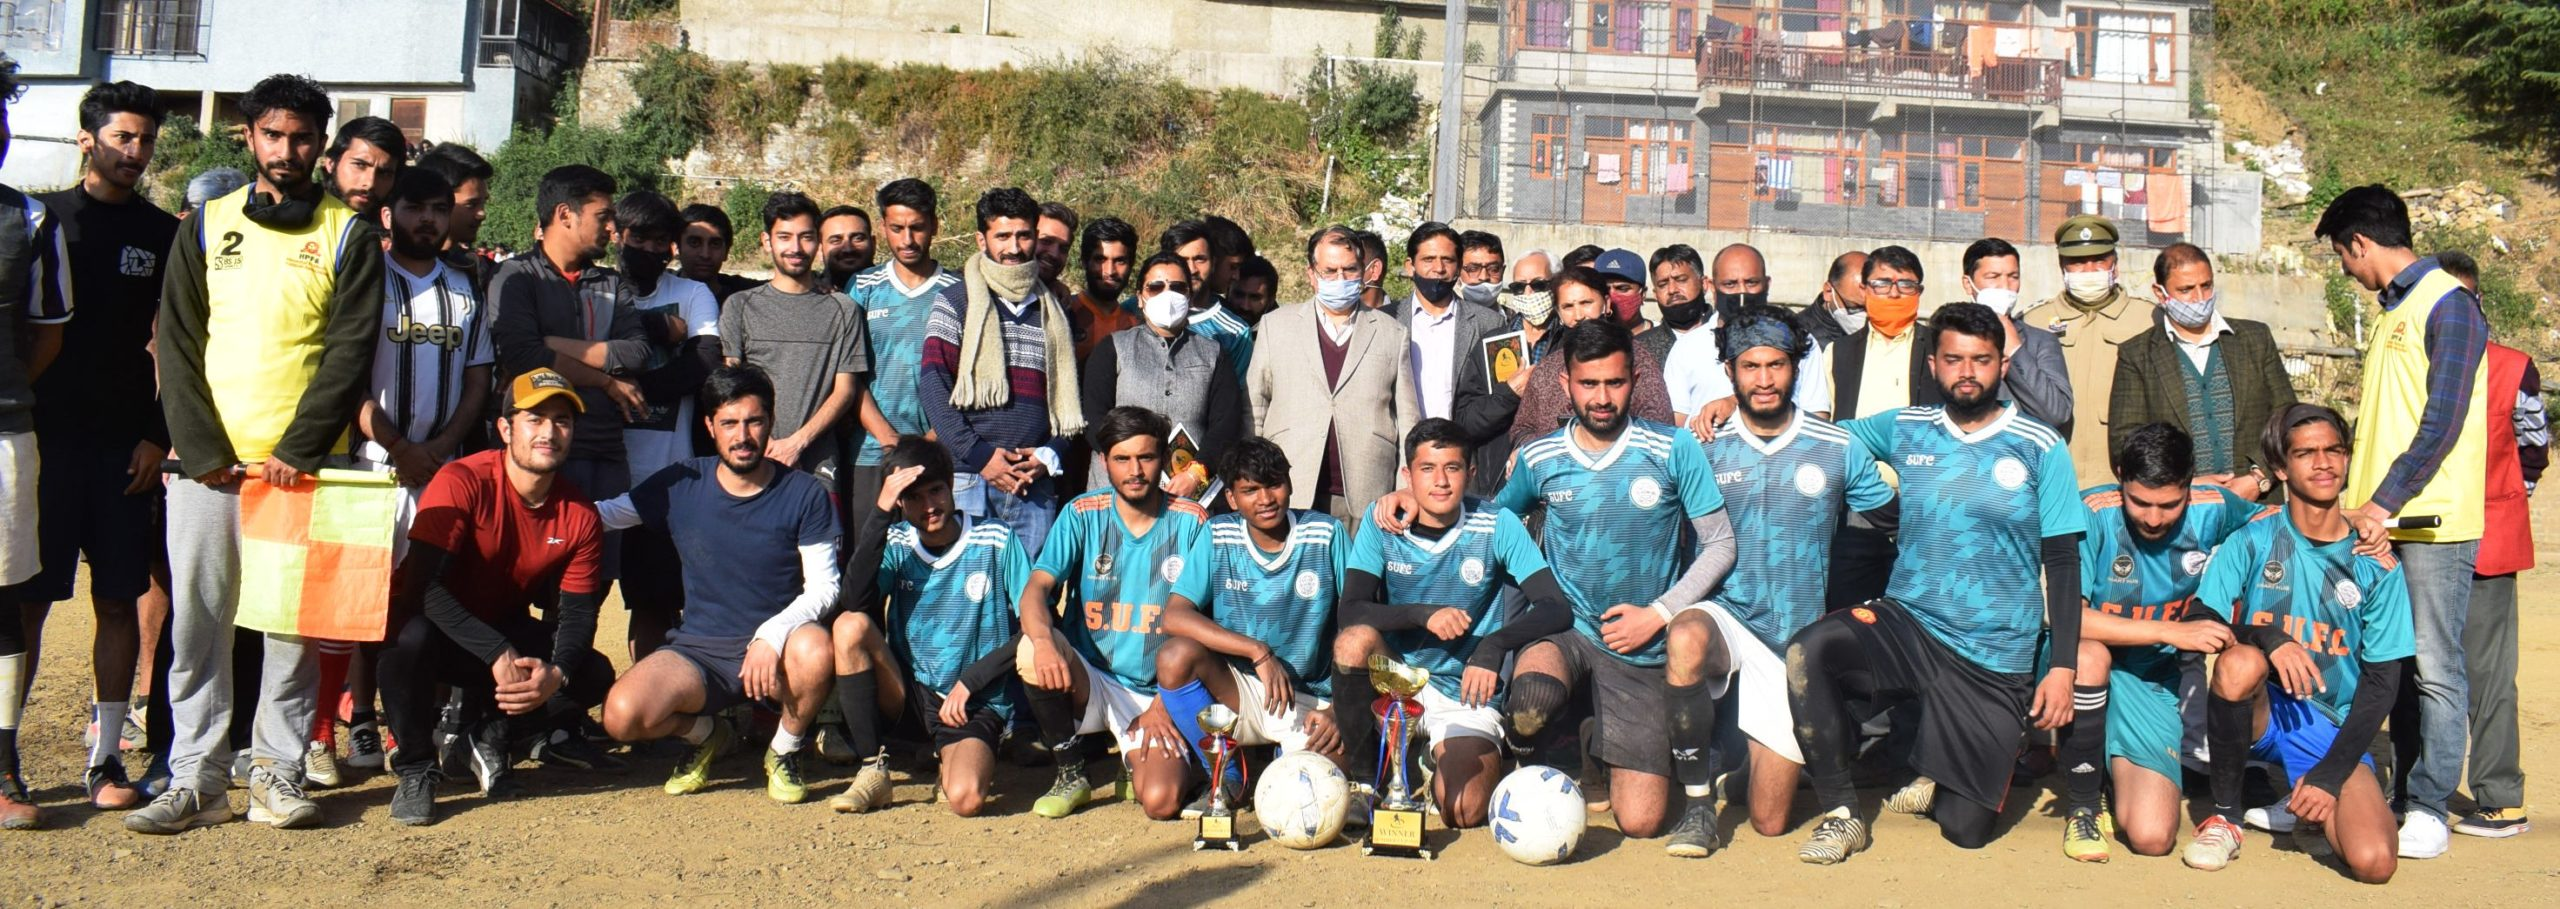 समरहिल यूनाईटेड फुटबाल क्लब द्वारा आयोजित 4 दिवसीय समरकप-2021 का समापान, सुरेश भारद्वाज ने नवाजे खिलाड़ी